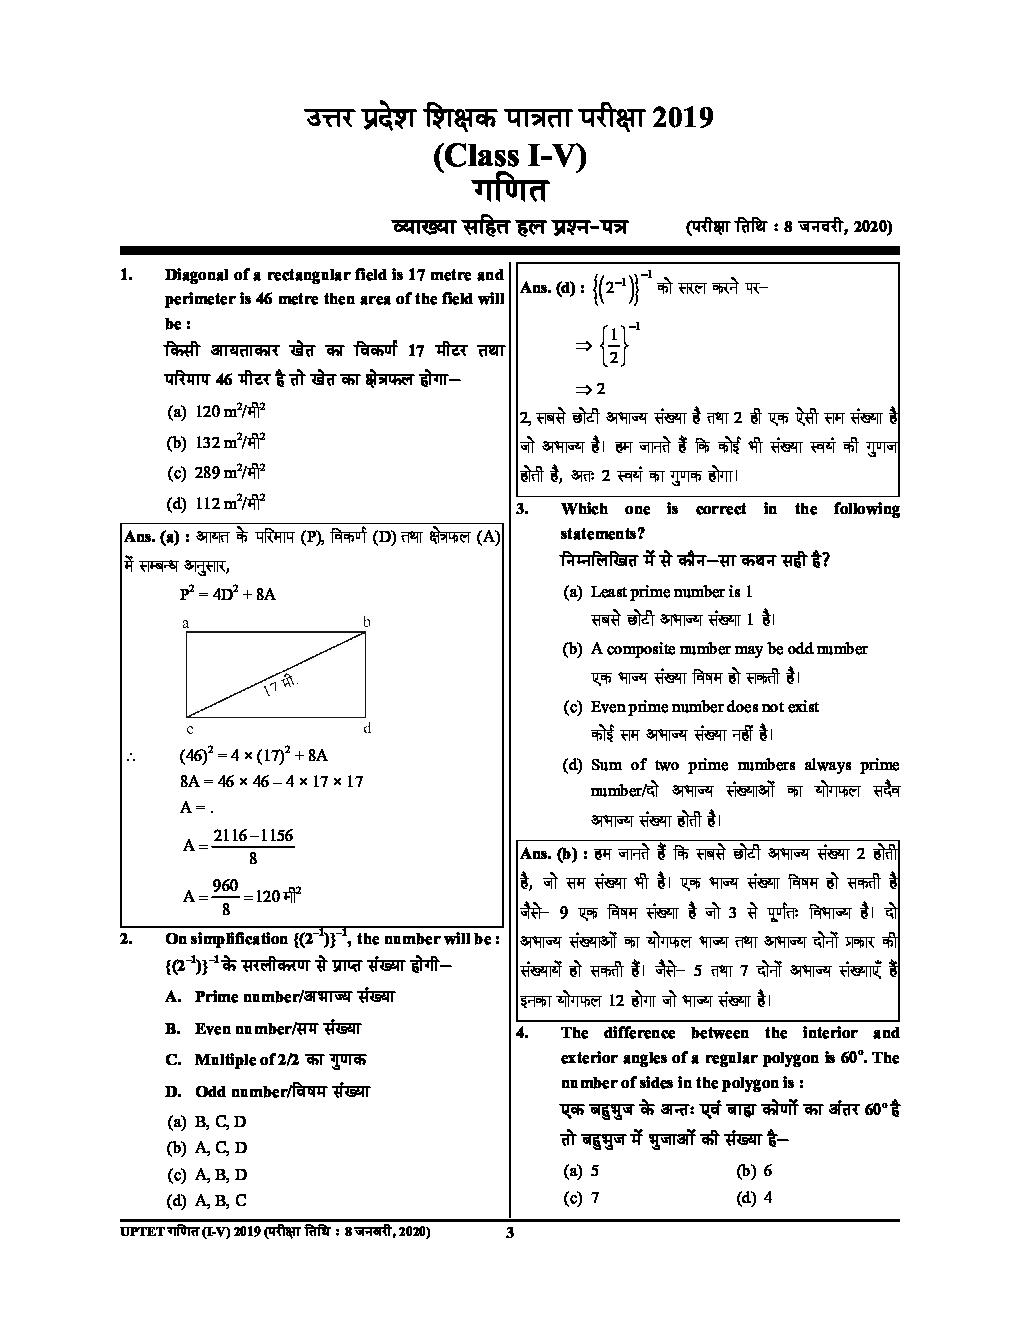 UP TET/CTET गणित सॉल्व्ड पेपर्स परीक्षा ज्ञान कोष Paper-I (2020-21) - Page 4